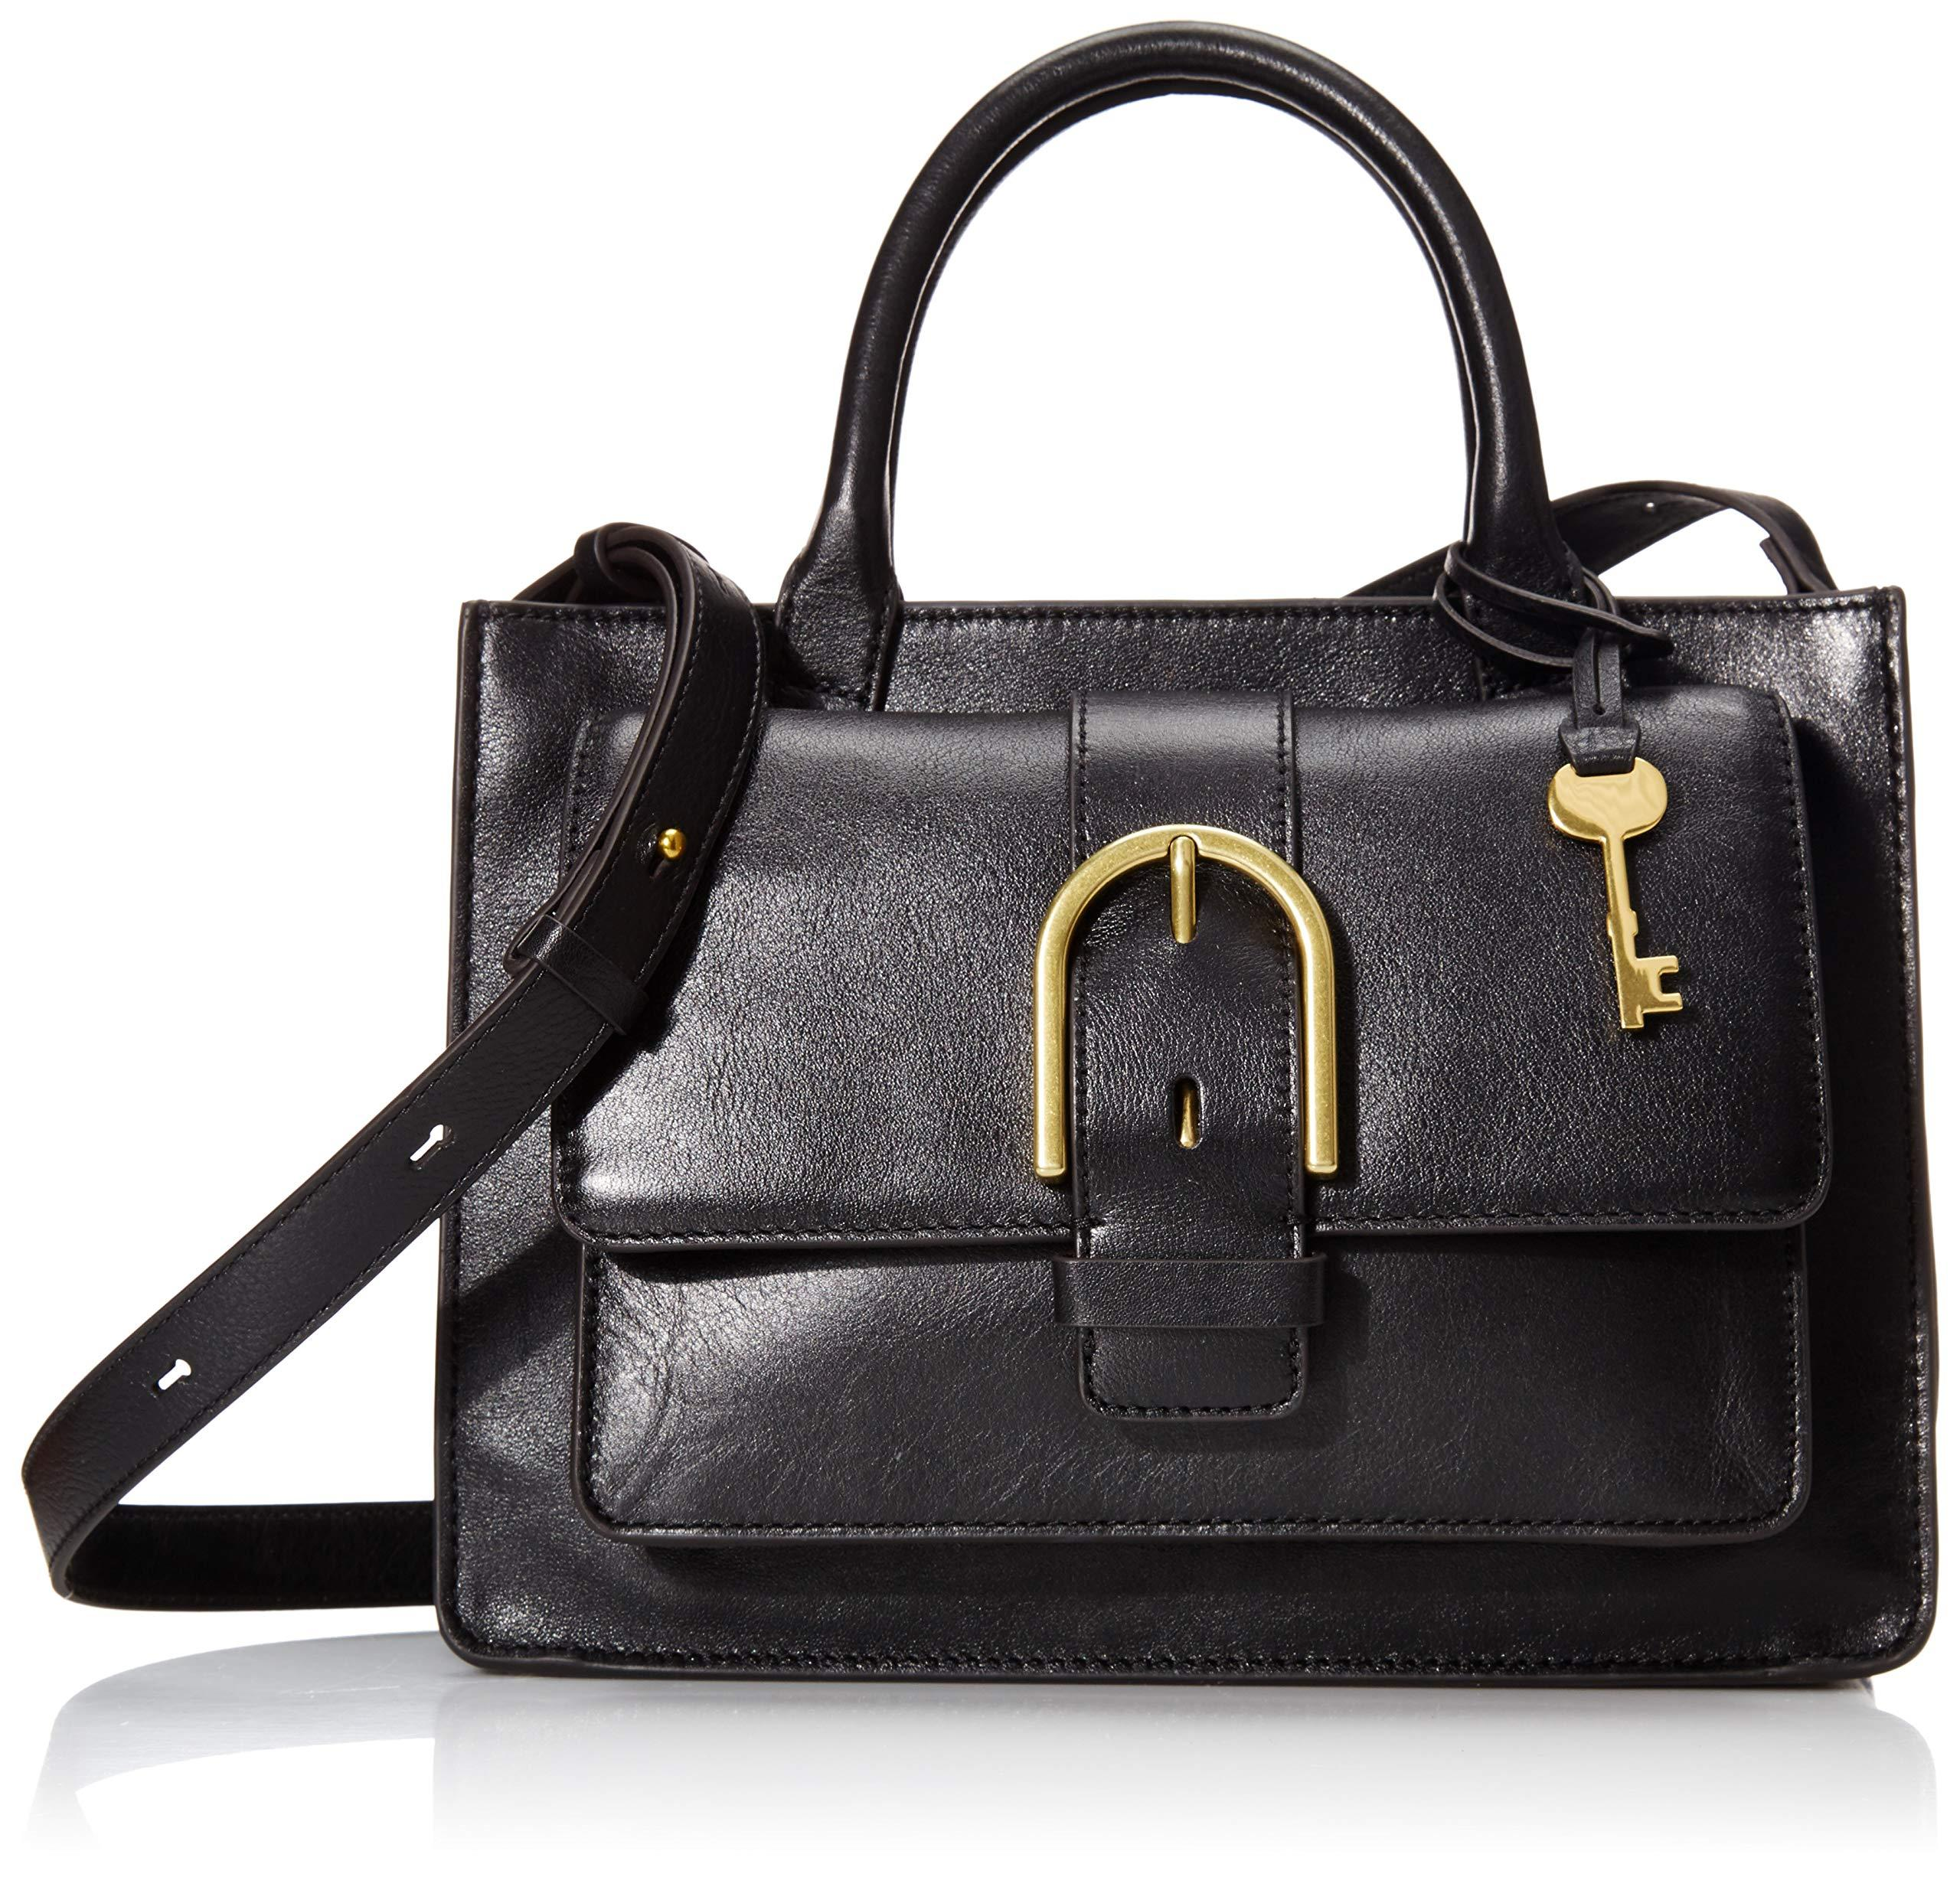 Fossil Wiley Leather Satchel Handbag in Black - Lyst